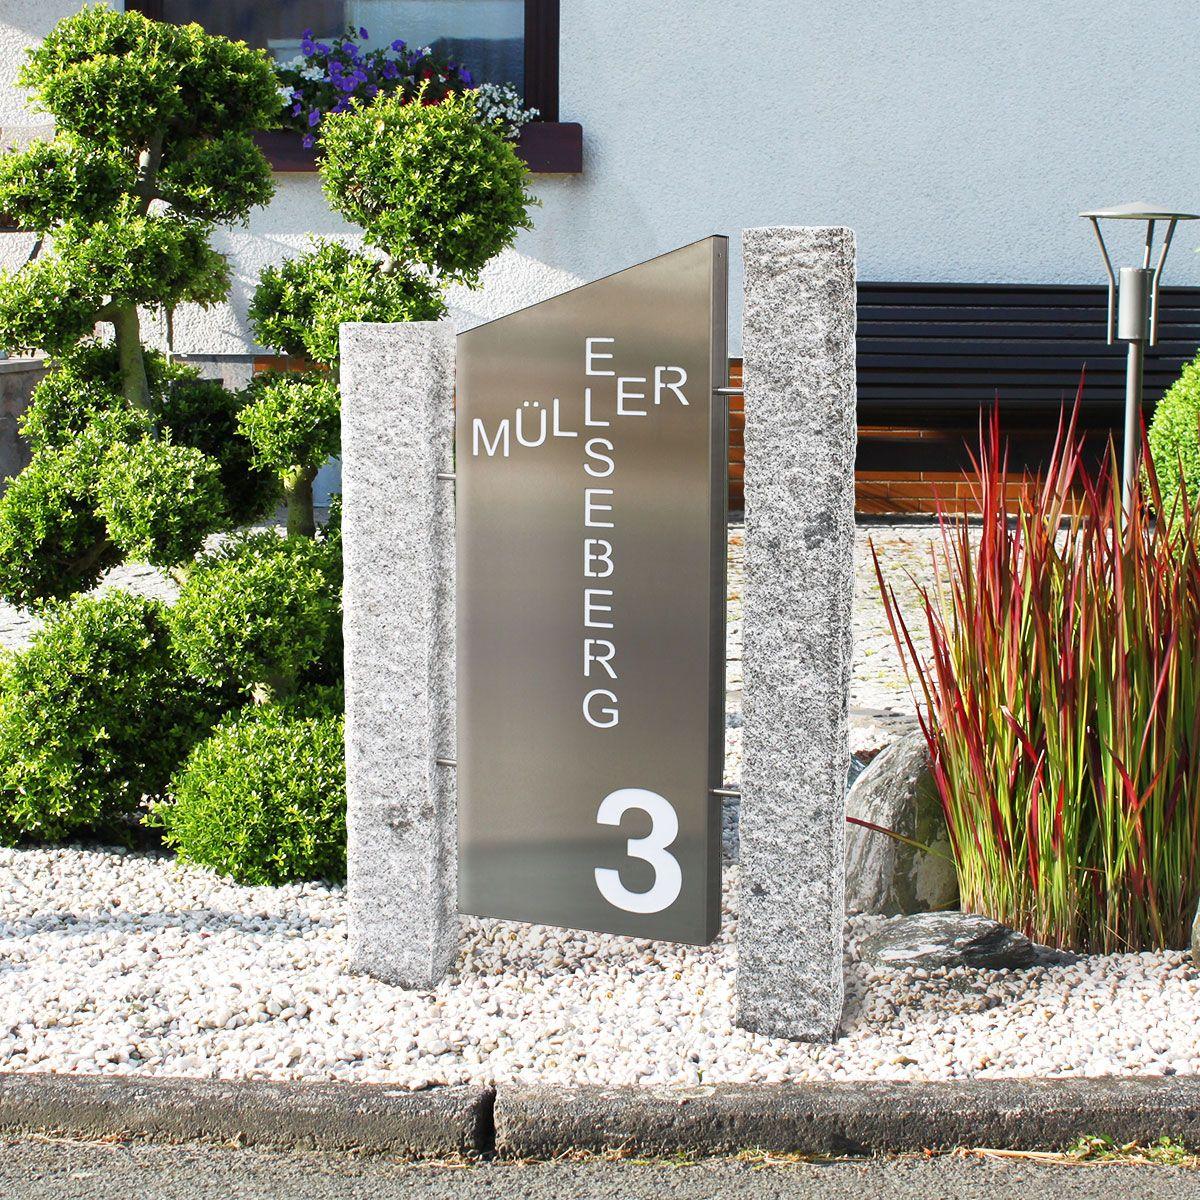 Led Stele Saule Storto Beleuchtet Mit Individuellem Schriftzug Beleuchtete Led Metall Saule Stele Wird Nach Kunden Hausnummer Beleuchtet Led Hausnummern